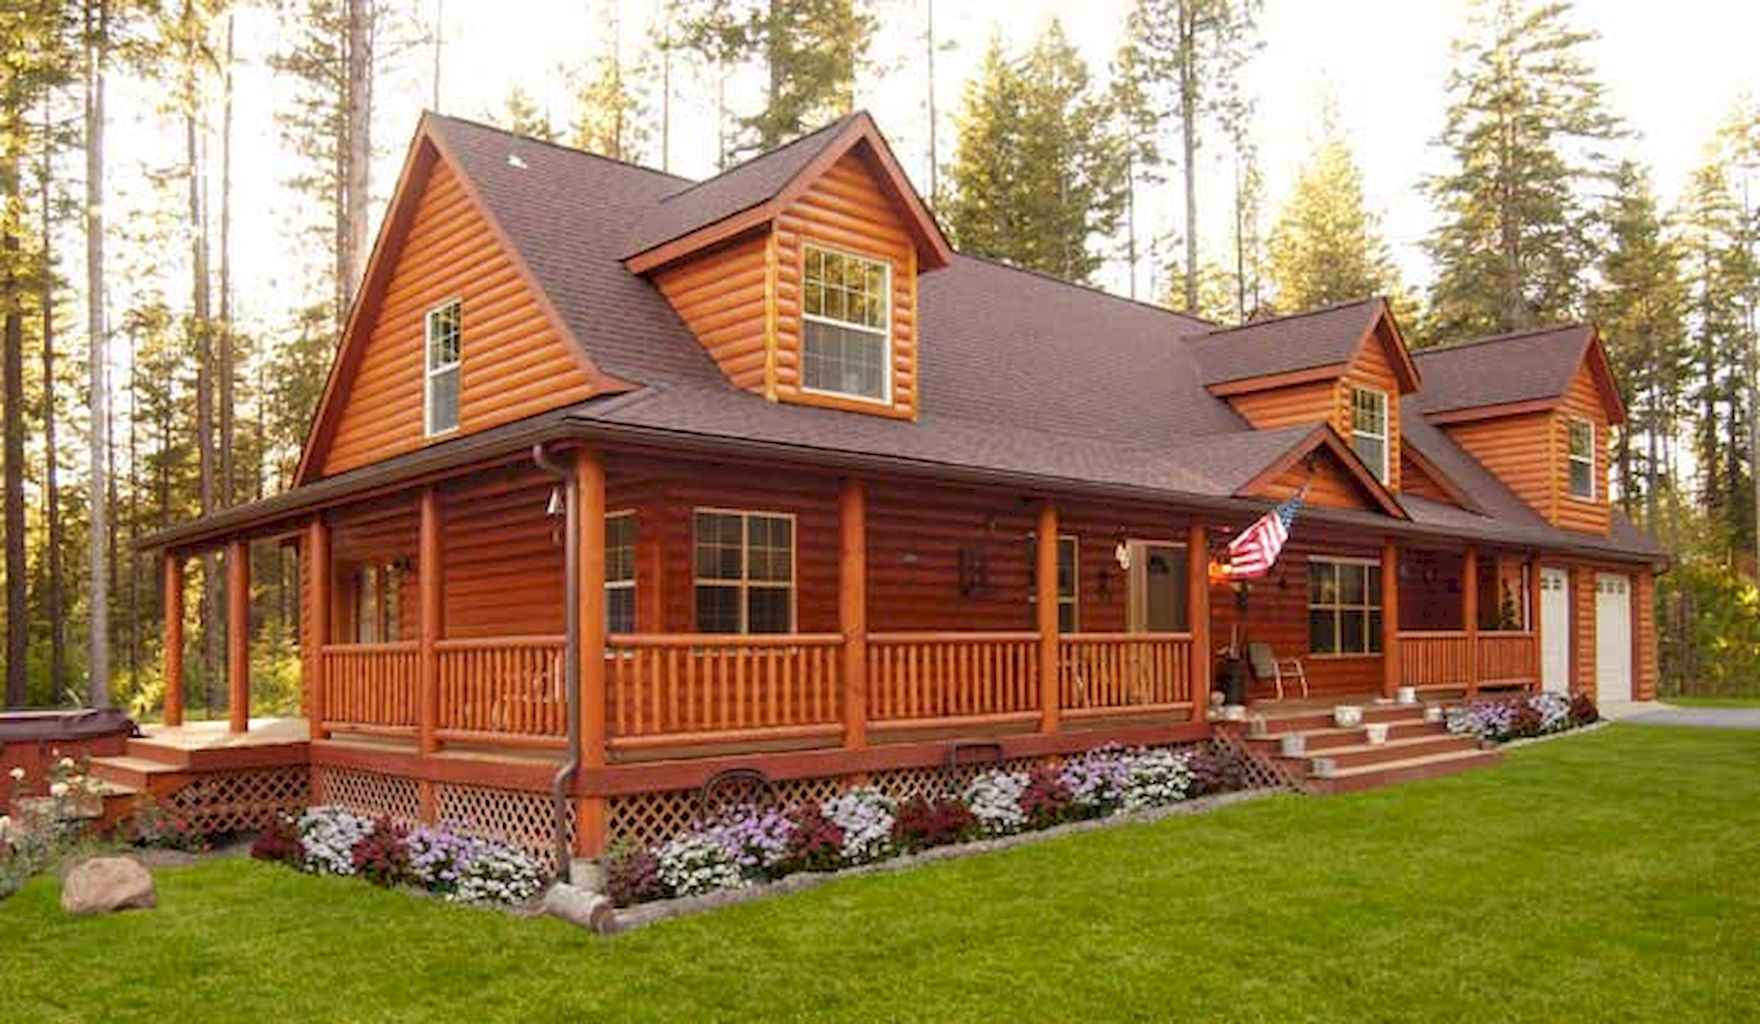 80 awesome victorian farmhouse plans design ideas (44)